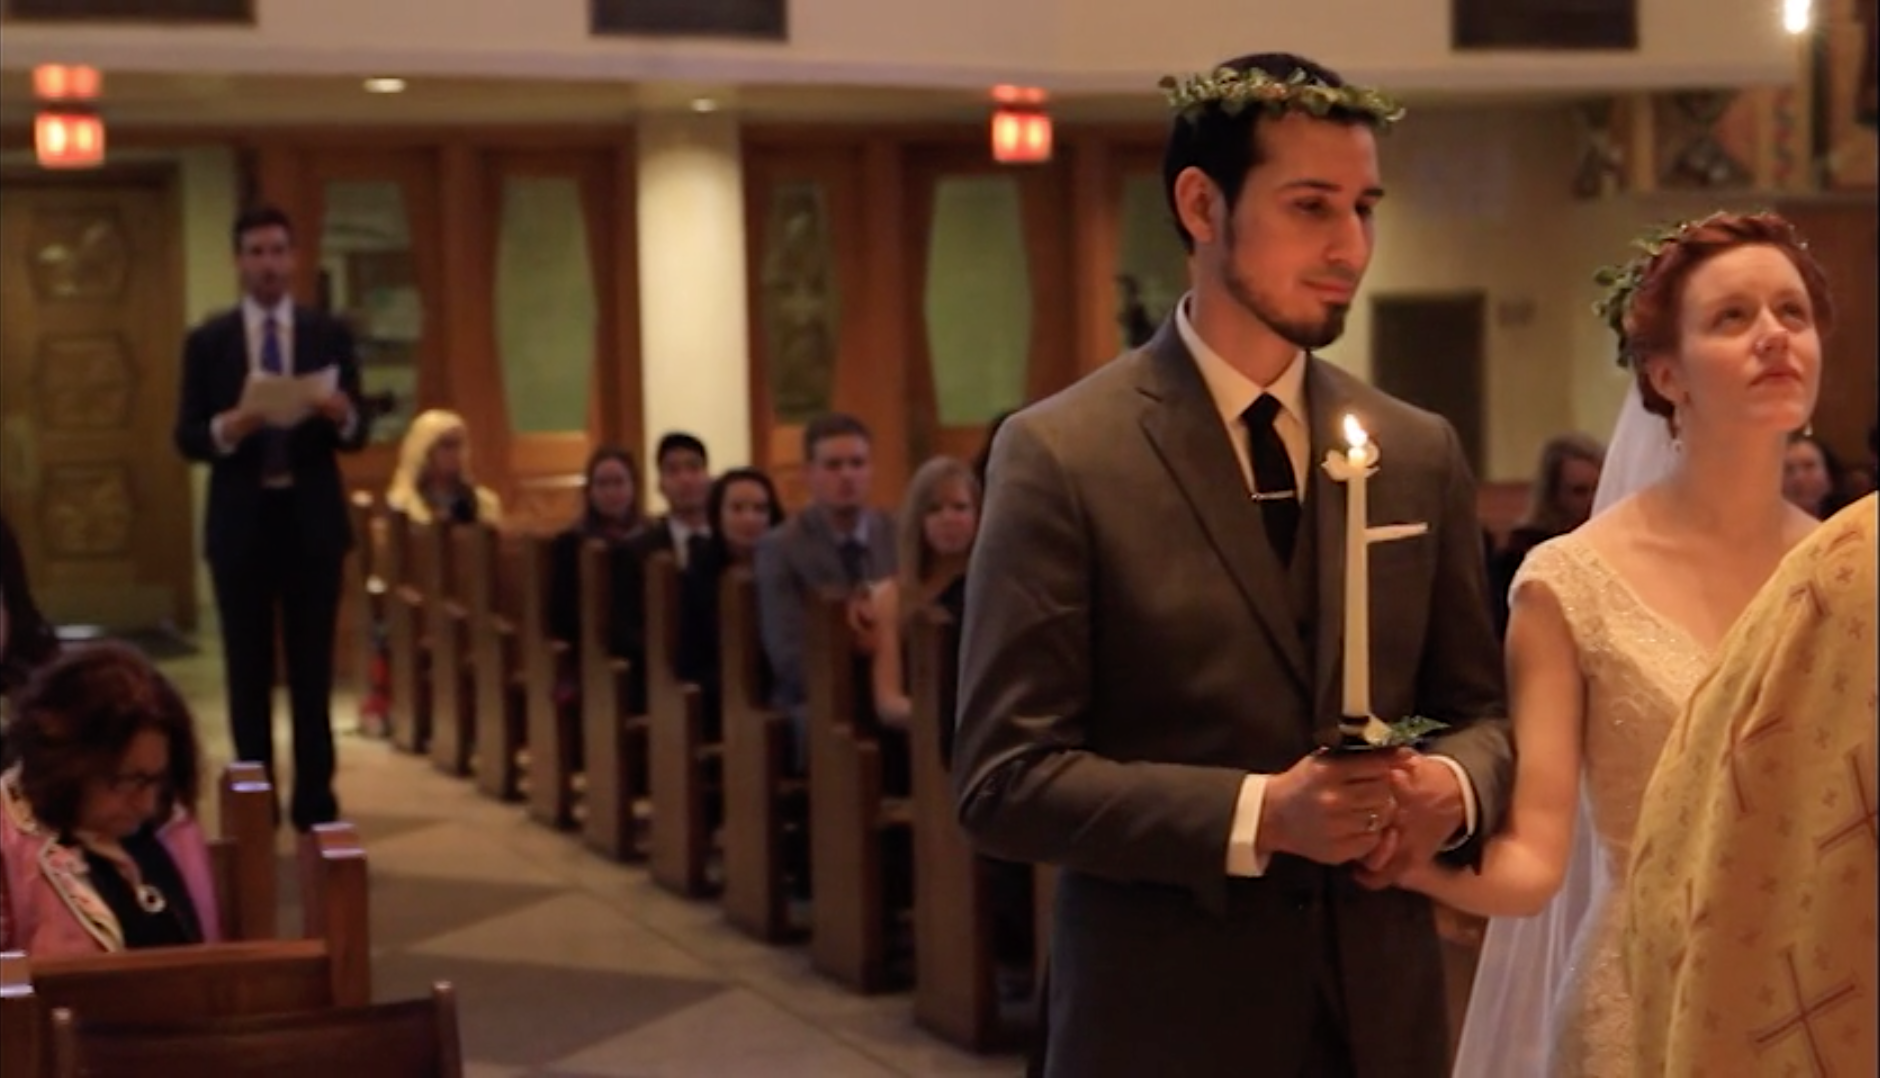 MENDEZ WEDDING